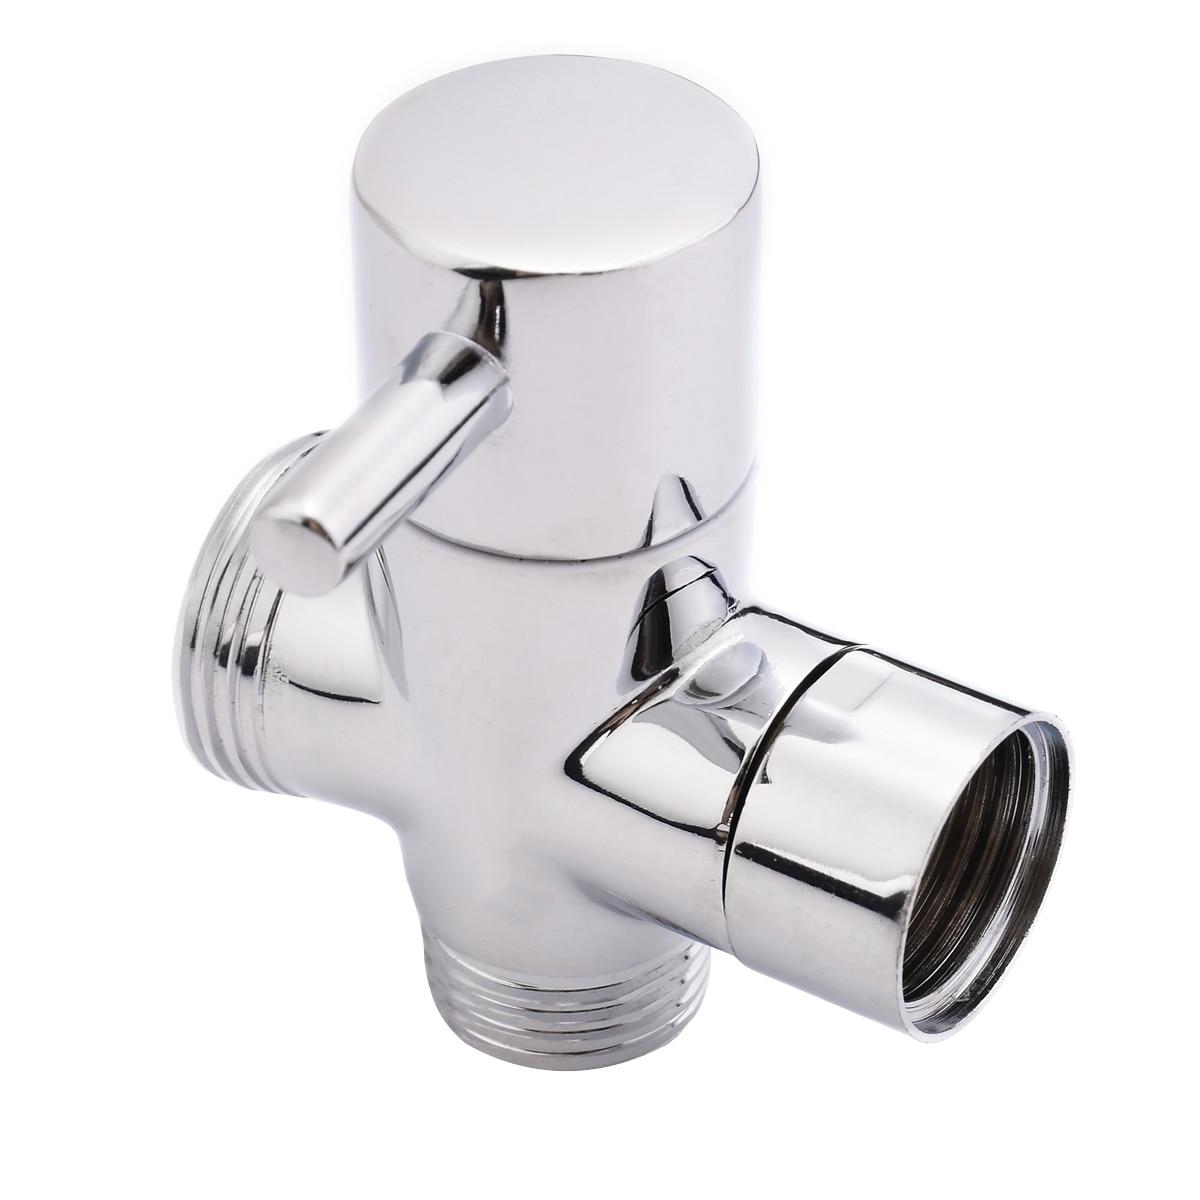 Brass 3-Ways Shower Head T-adapter Diverter Valve Toilet Sprayer Faucet Bathroom Accessory Part tulex black stop valve faucet angle valve brass diverter toilet valve shower head connector solid brass